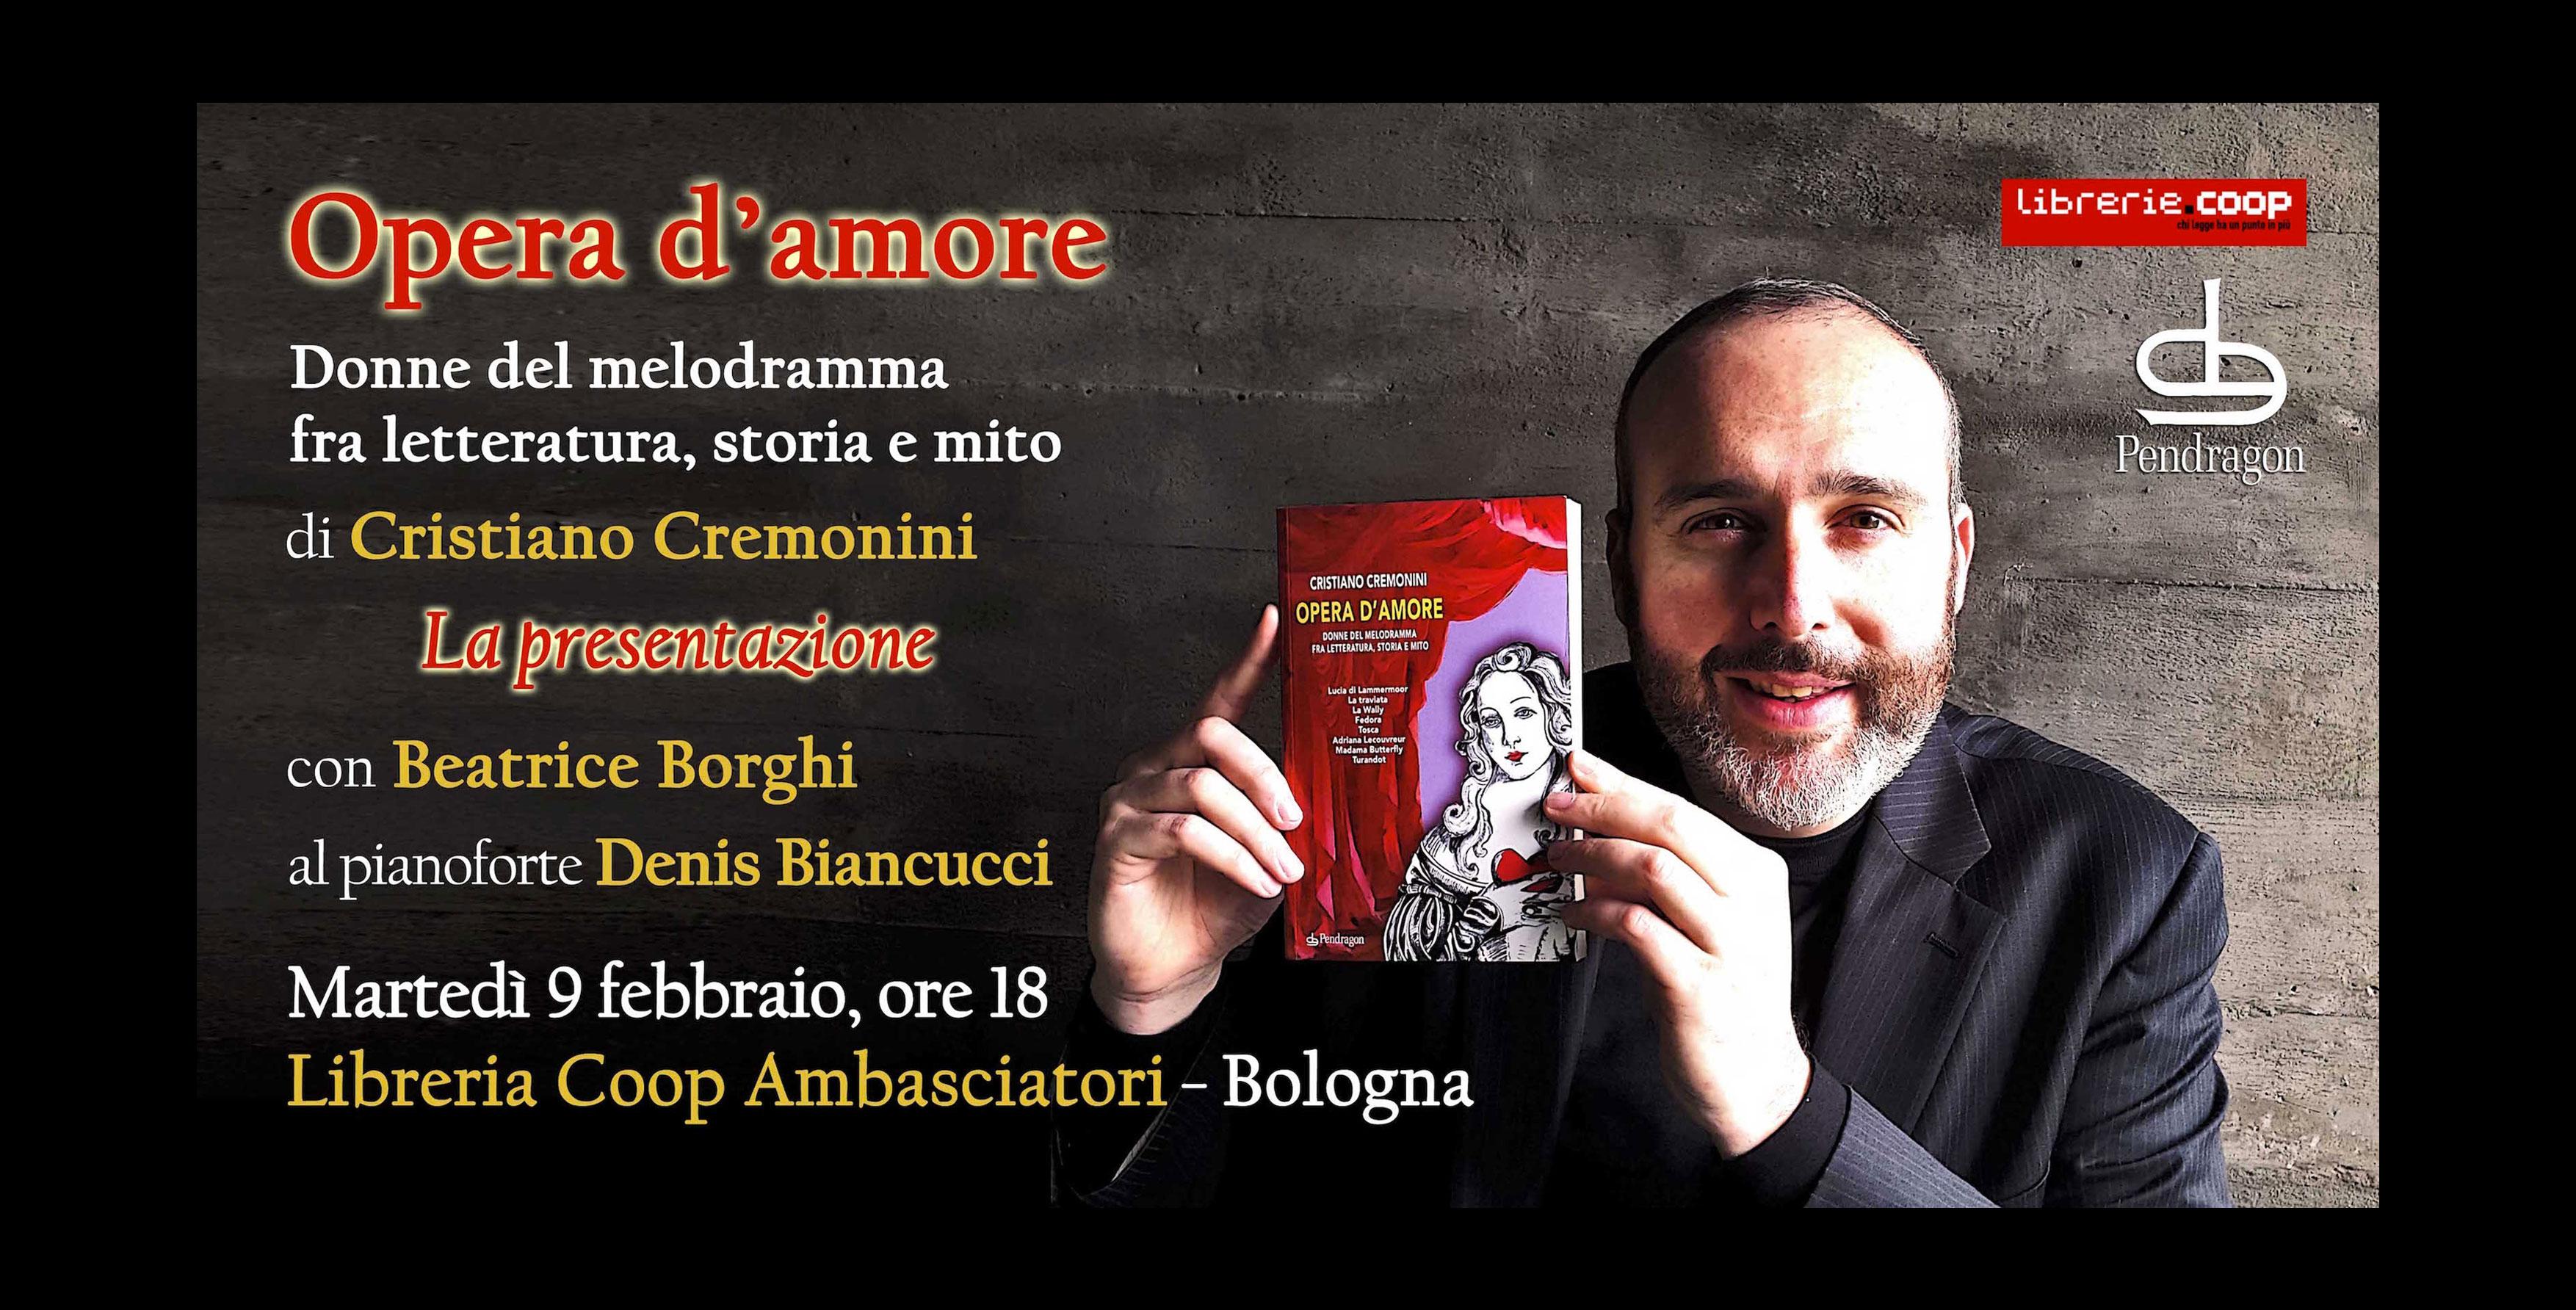 Opera-Amore-Cremonini-Ambasciatori-Coop-2016-Bologna